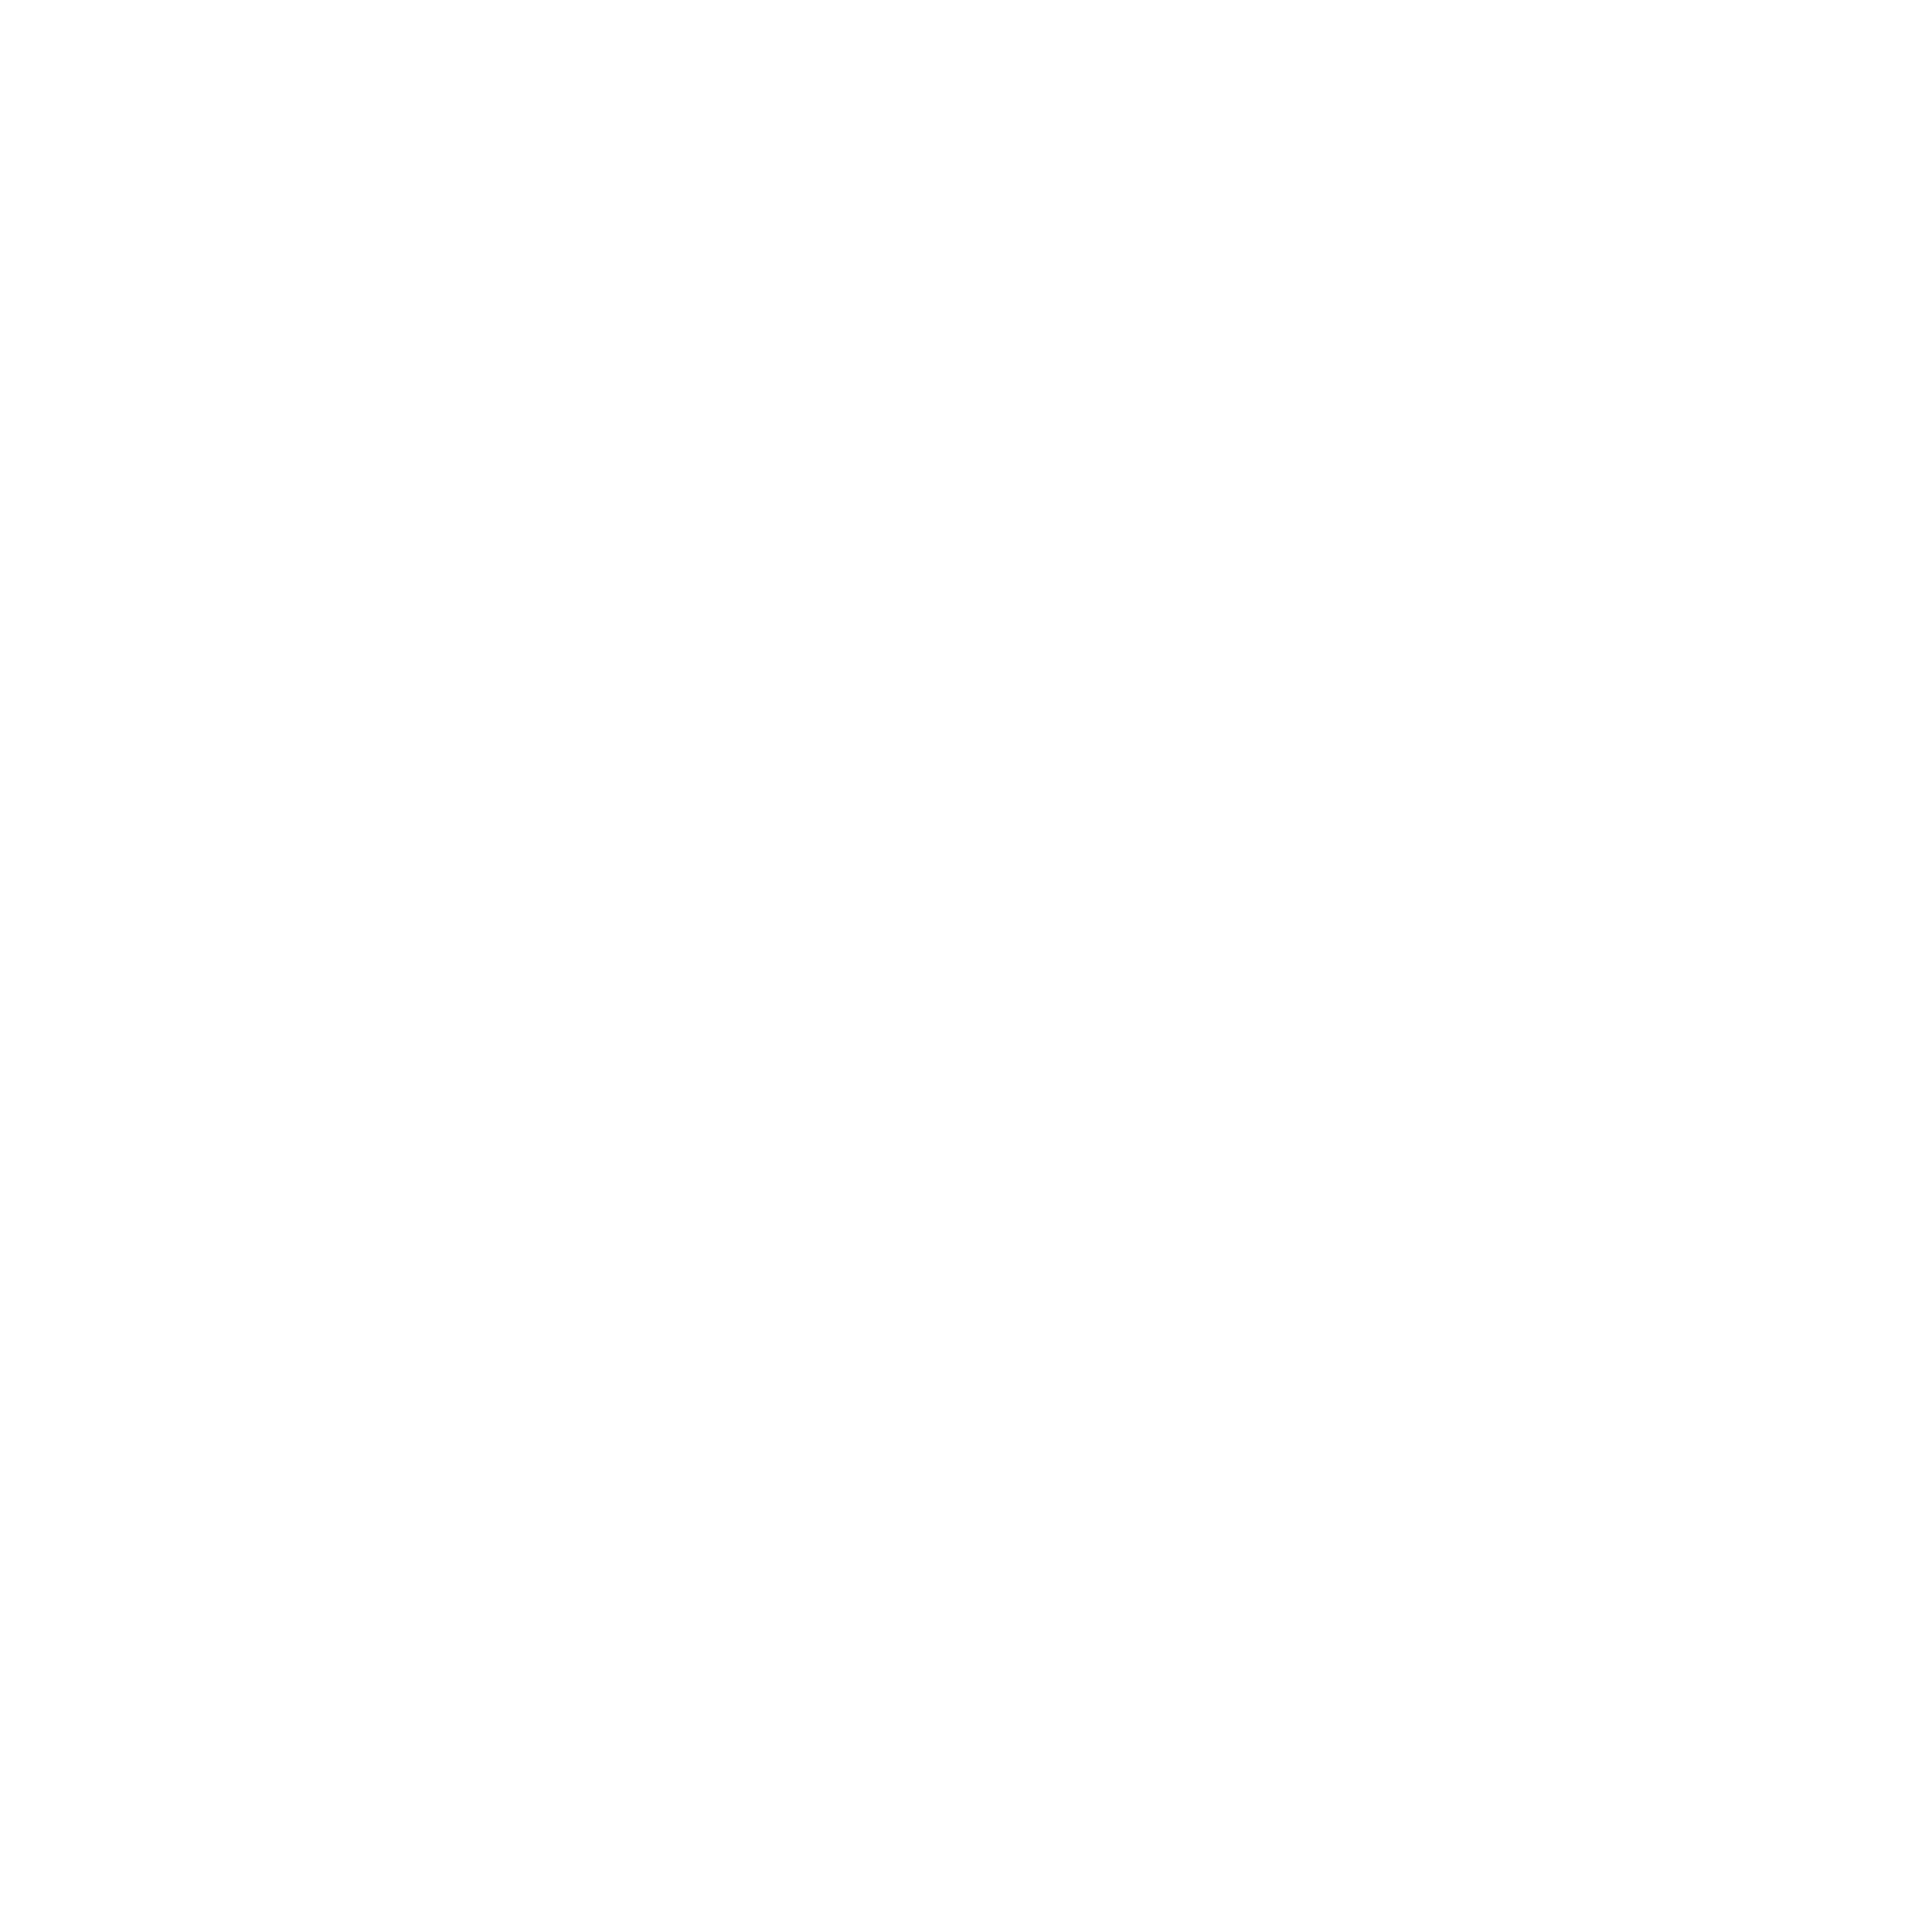 MANObbq